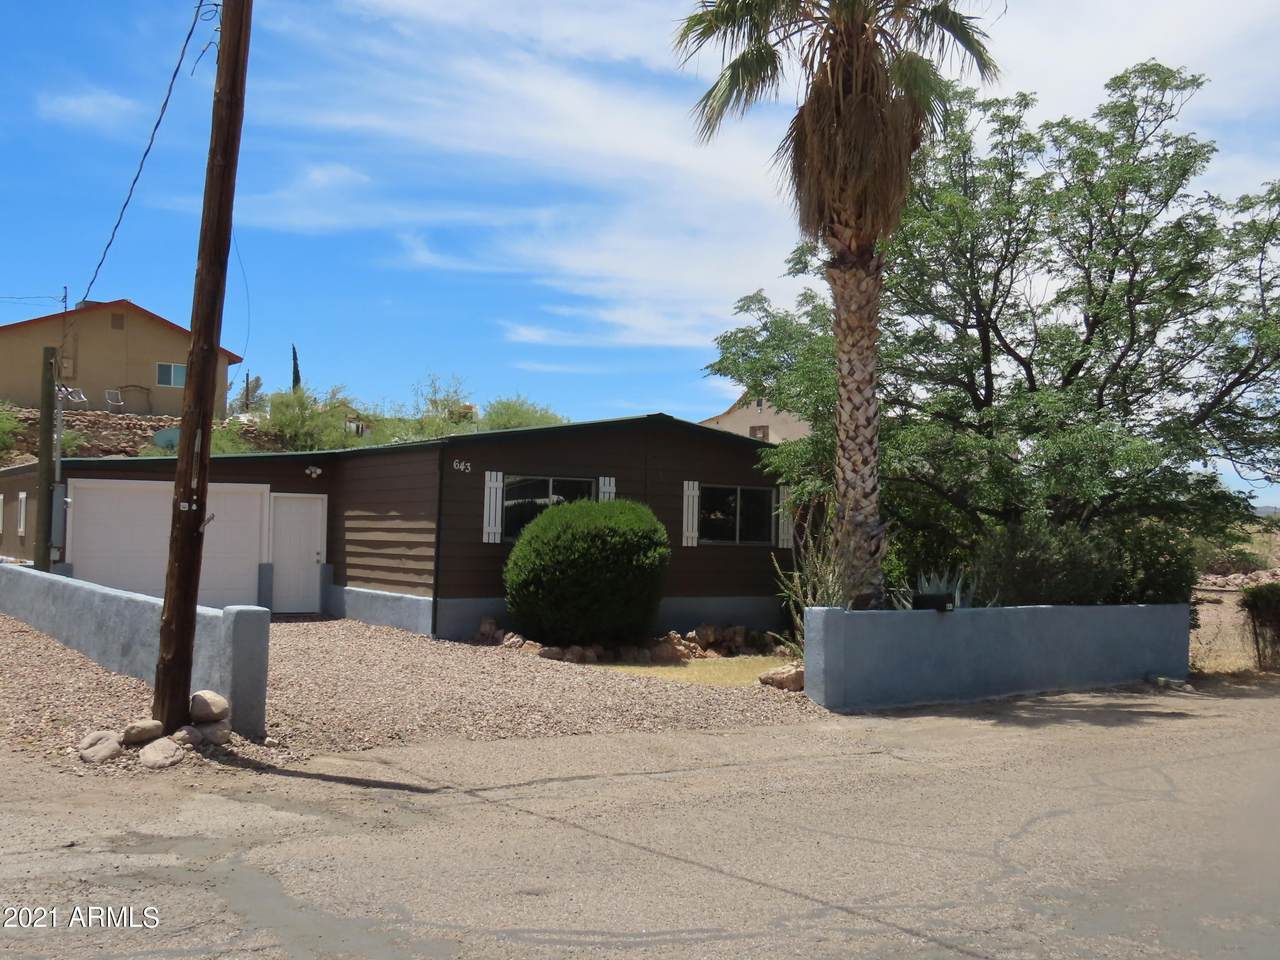 643 Sonora Street - Photo 1